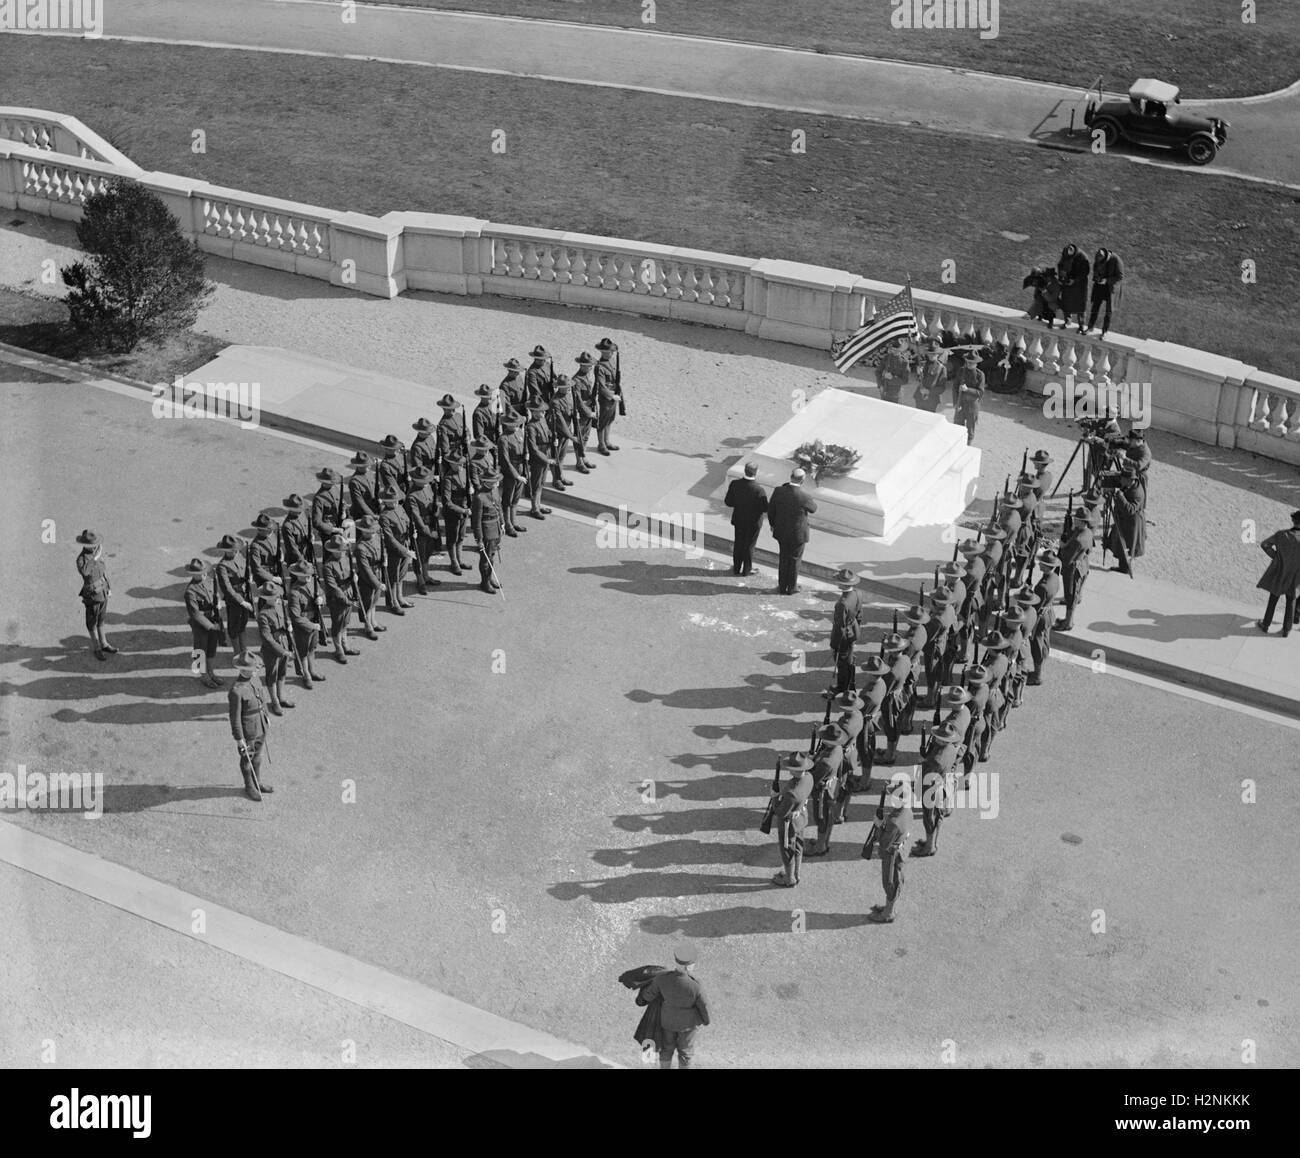 Militärische Formation am Grab des unbekannten Soldaten, Arlington National Cemetery, Arlington, Virginia, Stockbild